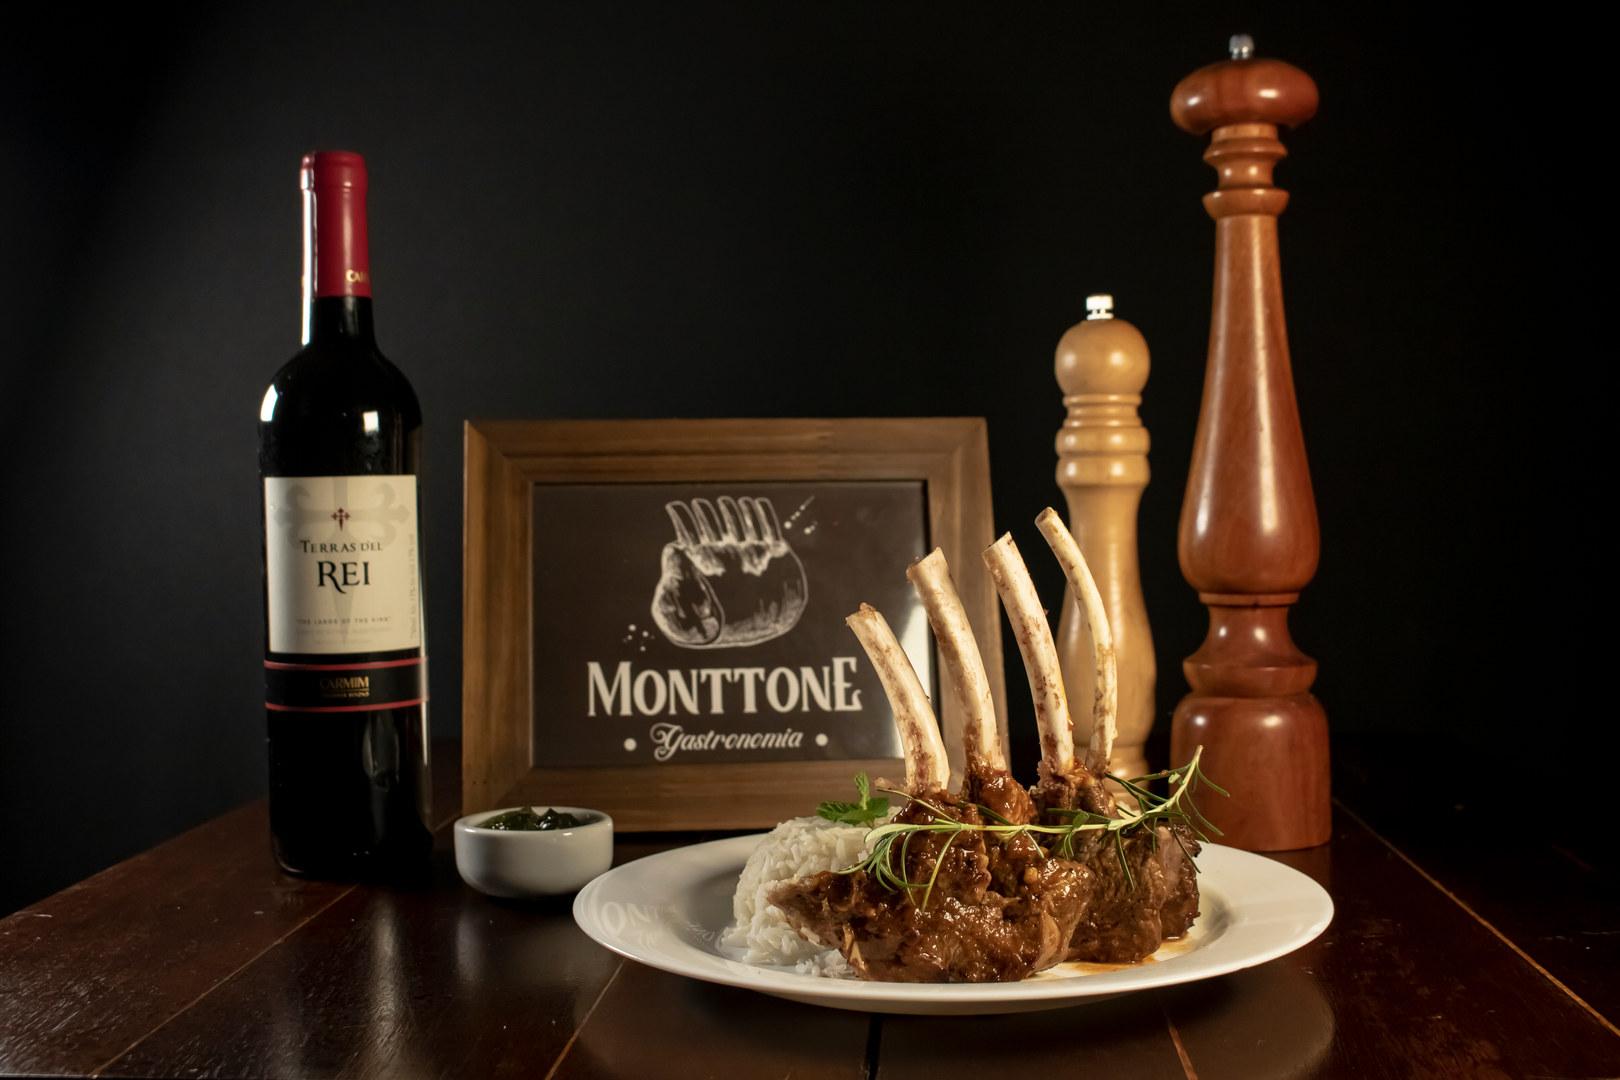 monttone gastronomia agencia politof joao politof